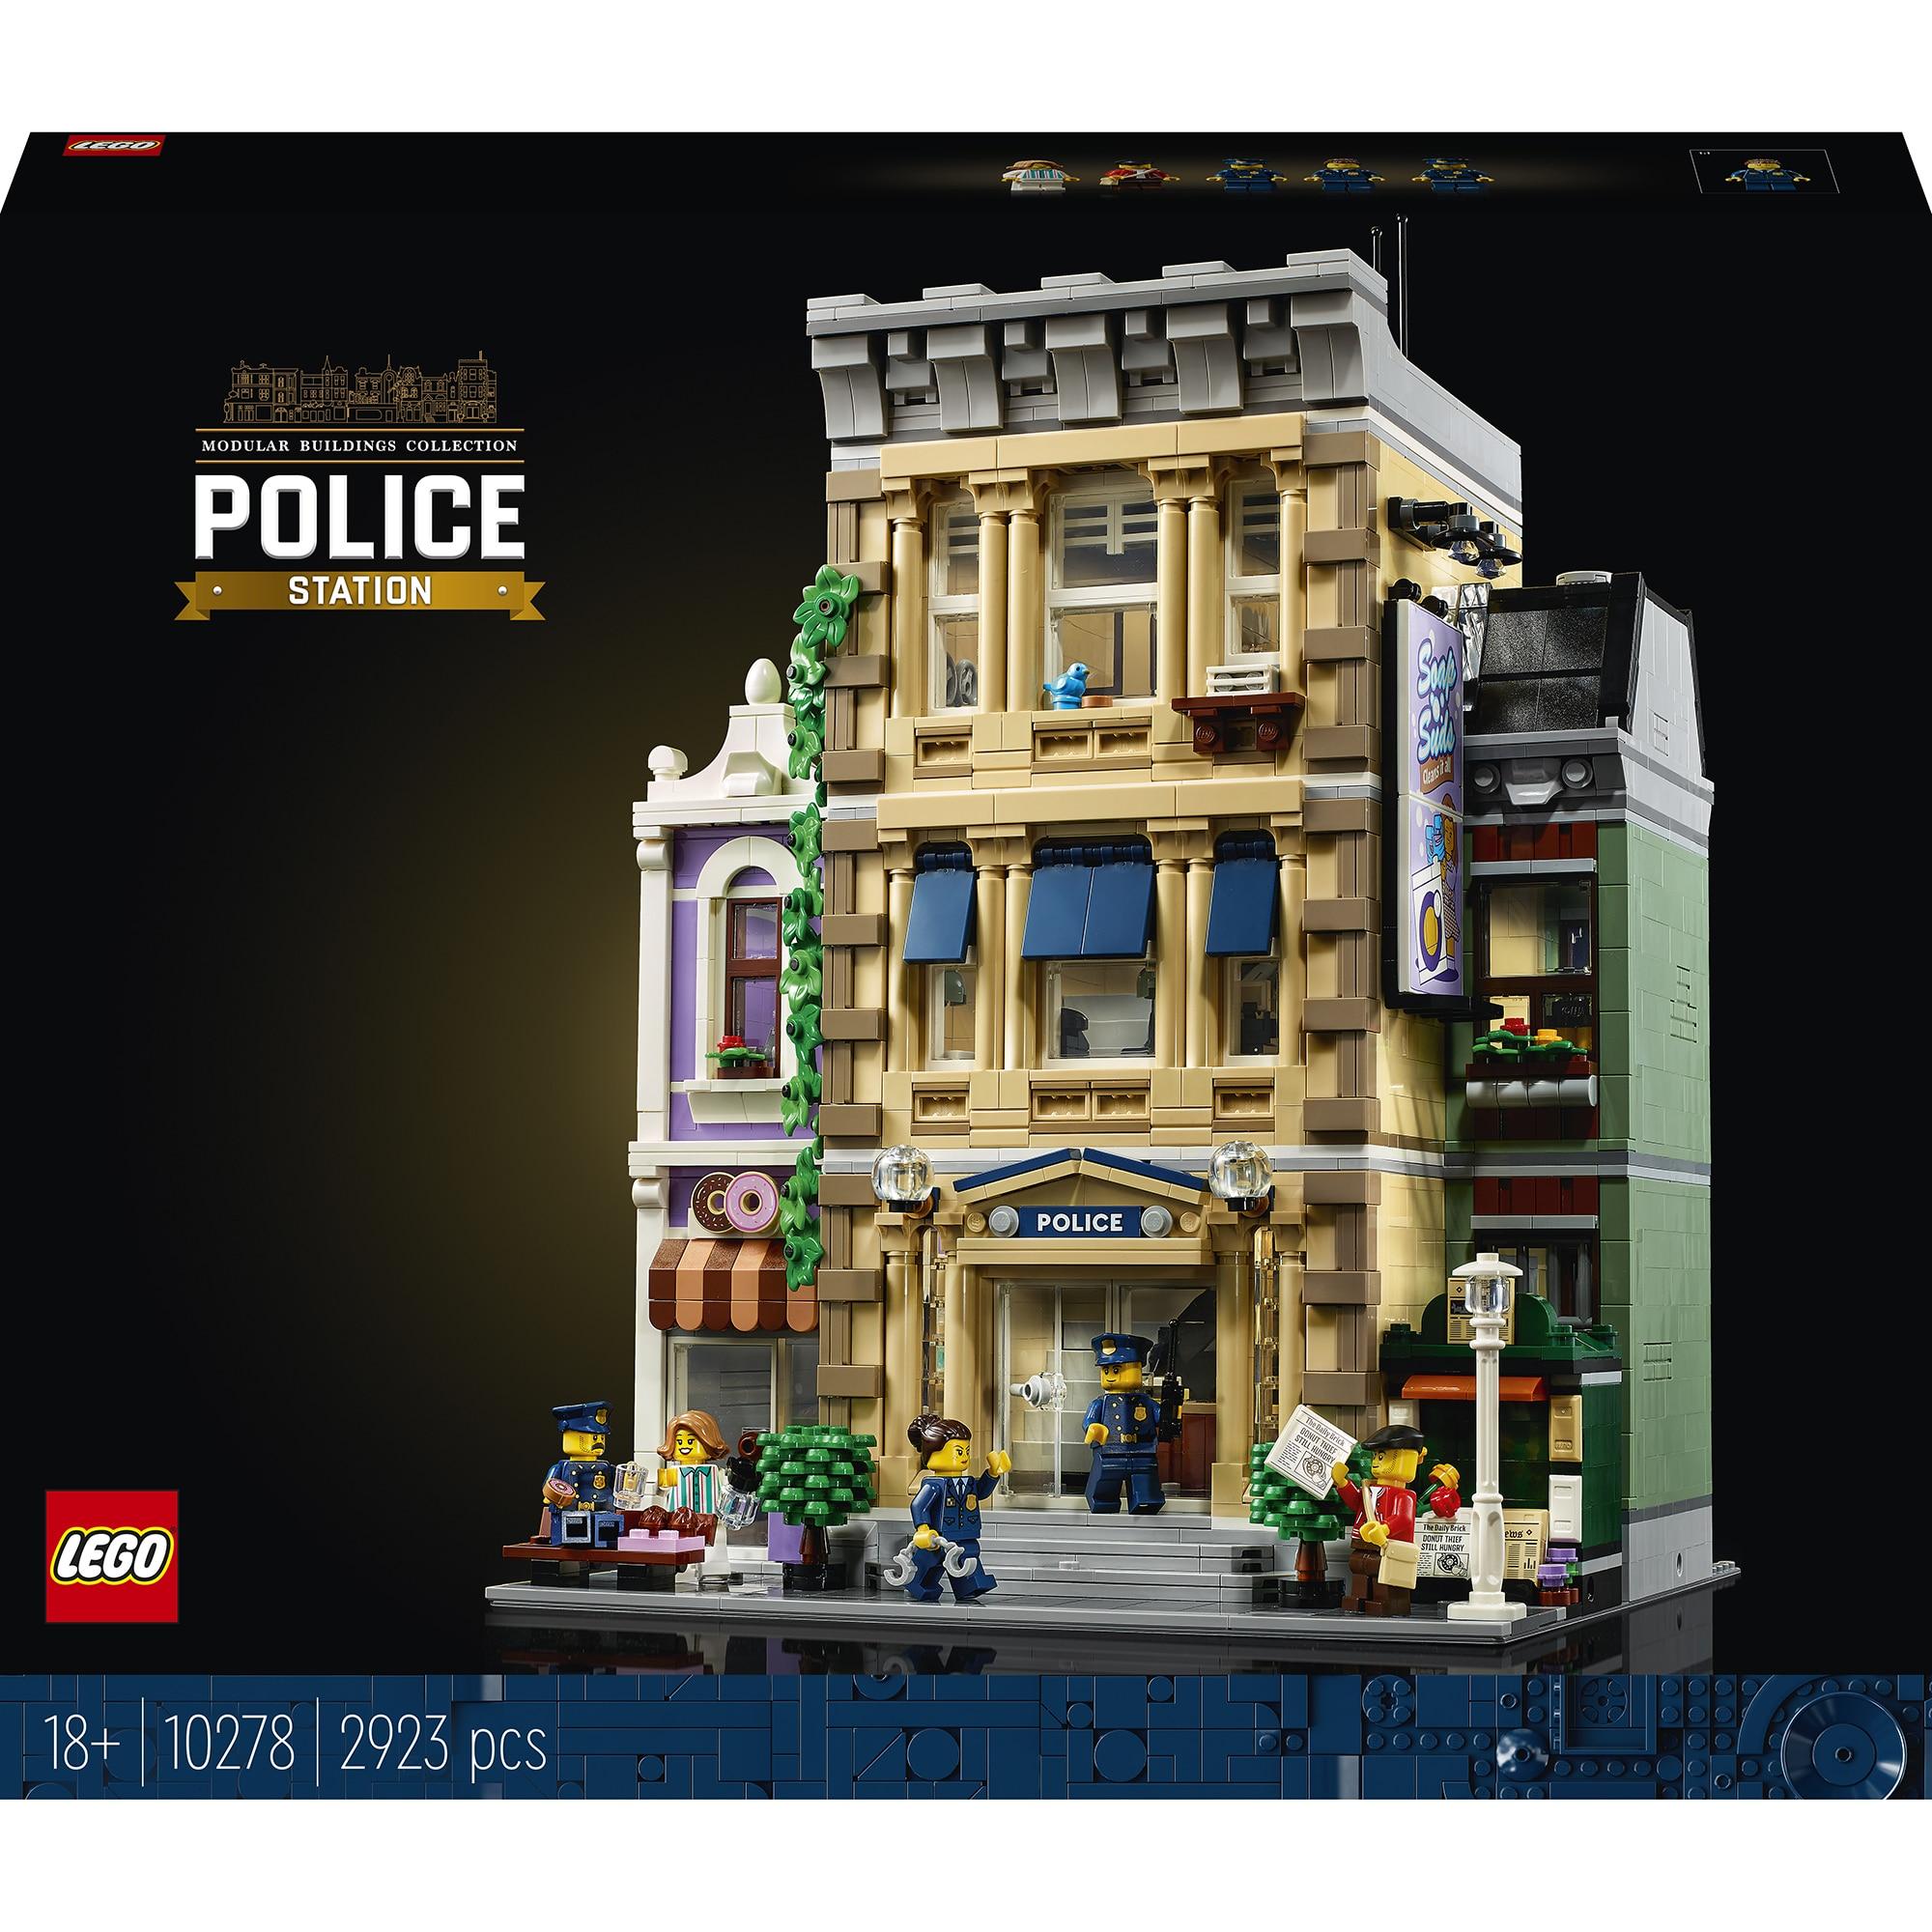 Fotografie LEGO Creator Expert - Sectia de Politie 10278, 2923 piese